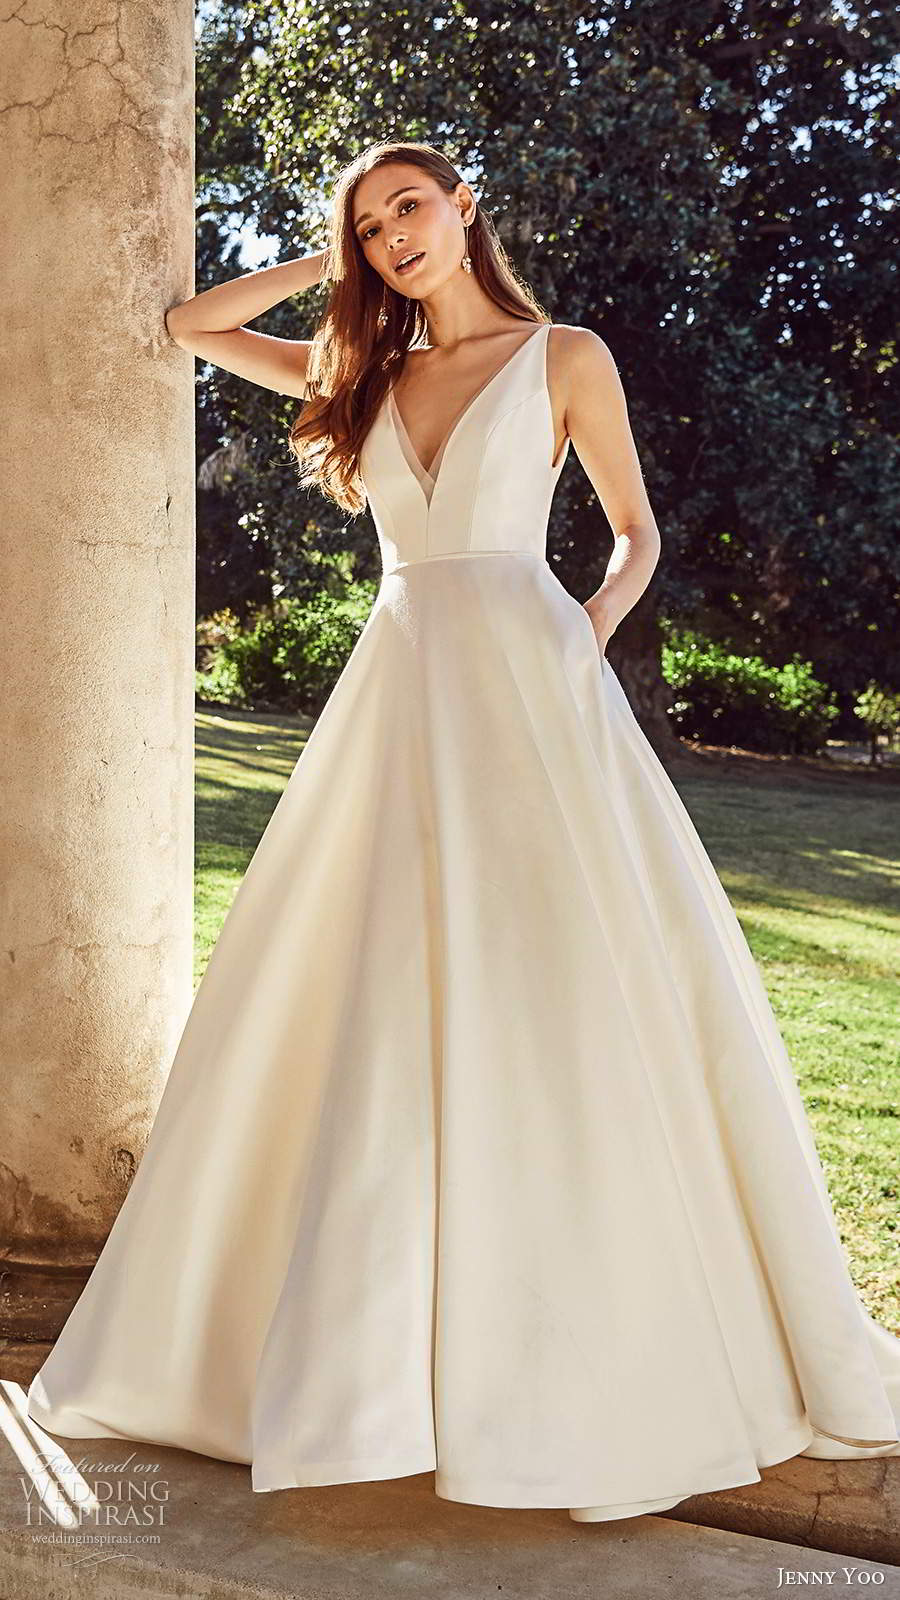 jenny yoo spring 2020 bridal sleeeless straps v neckline minimalist clean a line ball gown wedding dress v back chapel train (5) mv